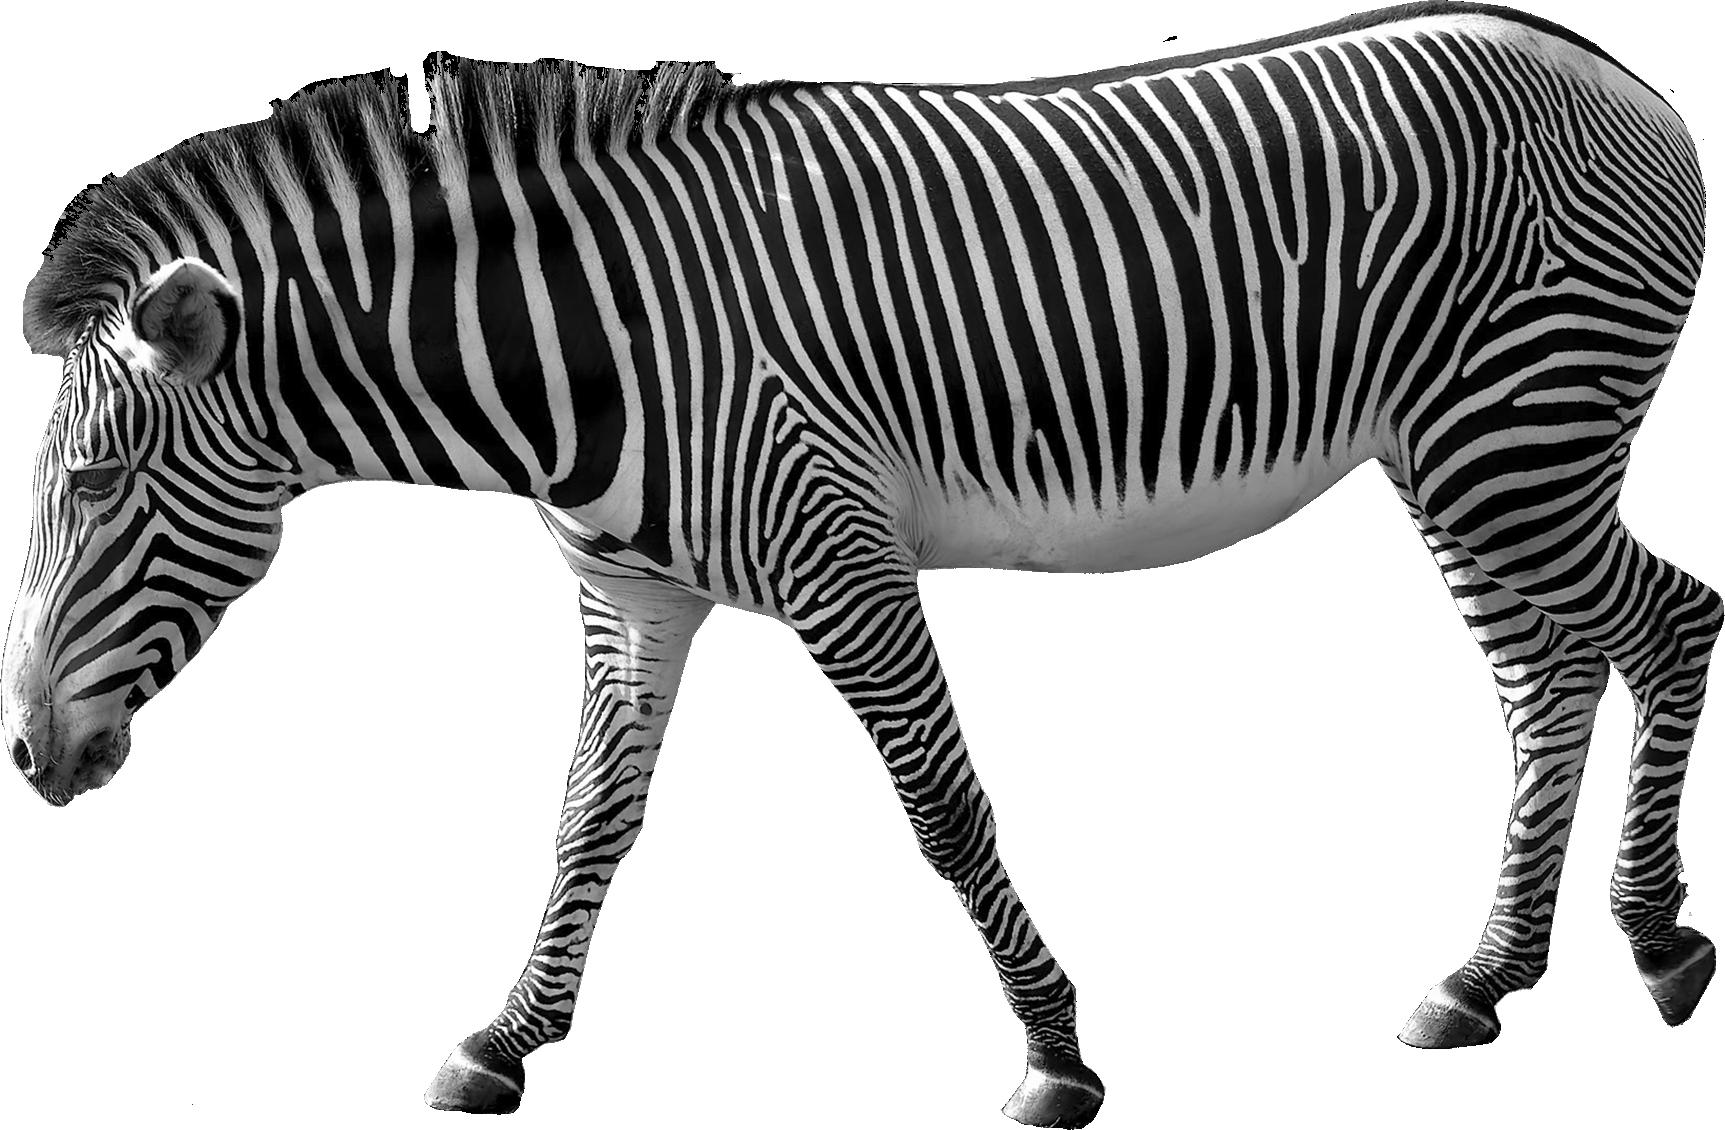 Zebra PNG image - Zebra PNG - Zebra HD PNG